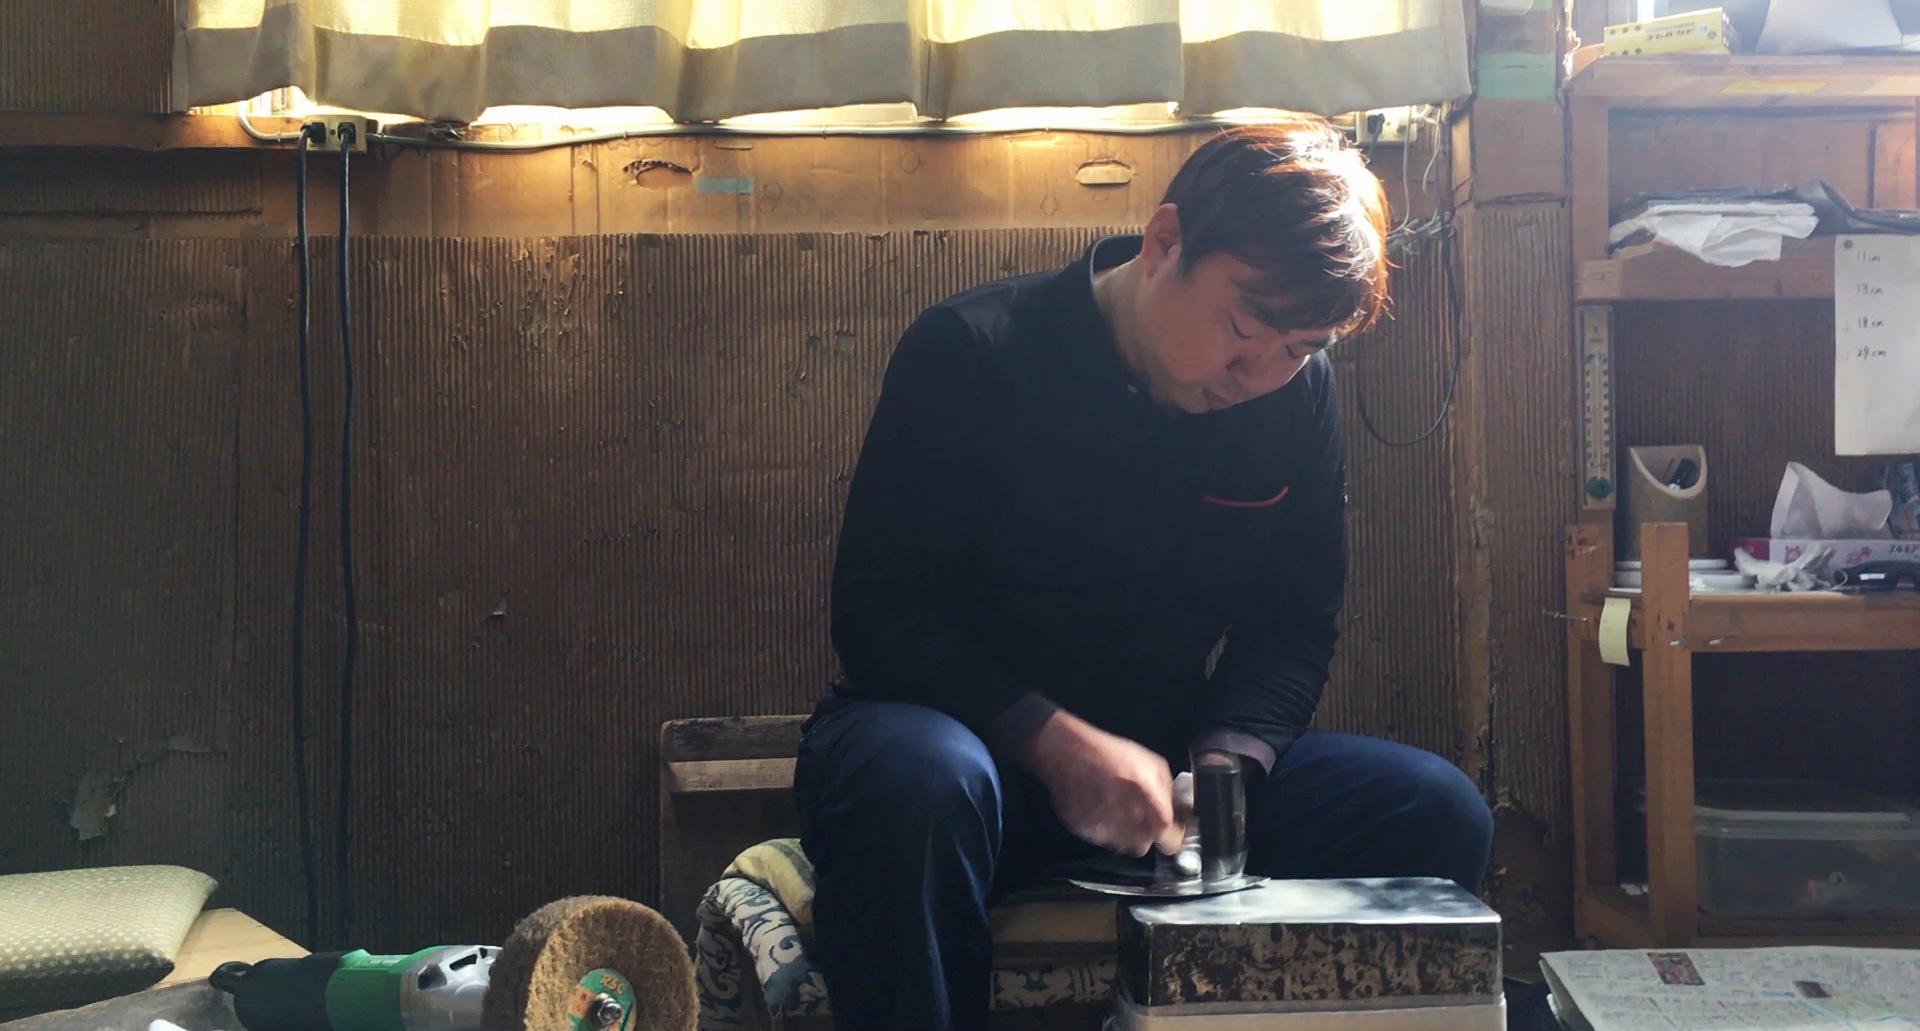 Atelier+Takumi+_+Craftsman+Orin+_Shimatani+Orin+Syouryu+Koubou.jpg